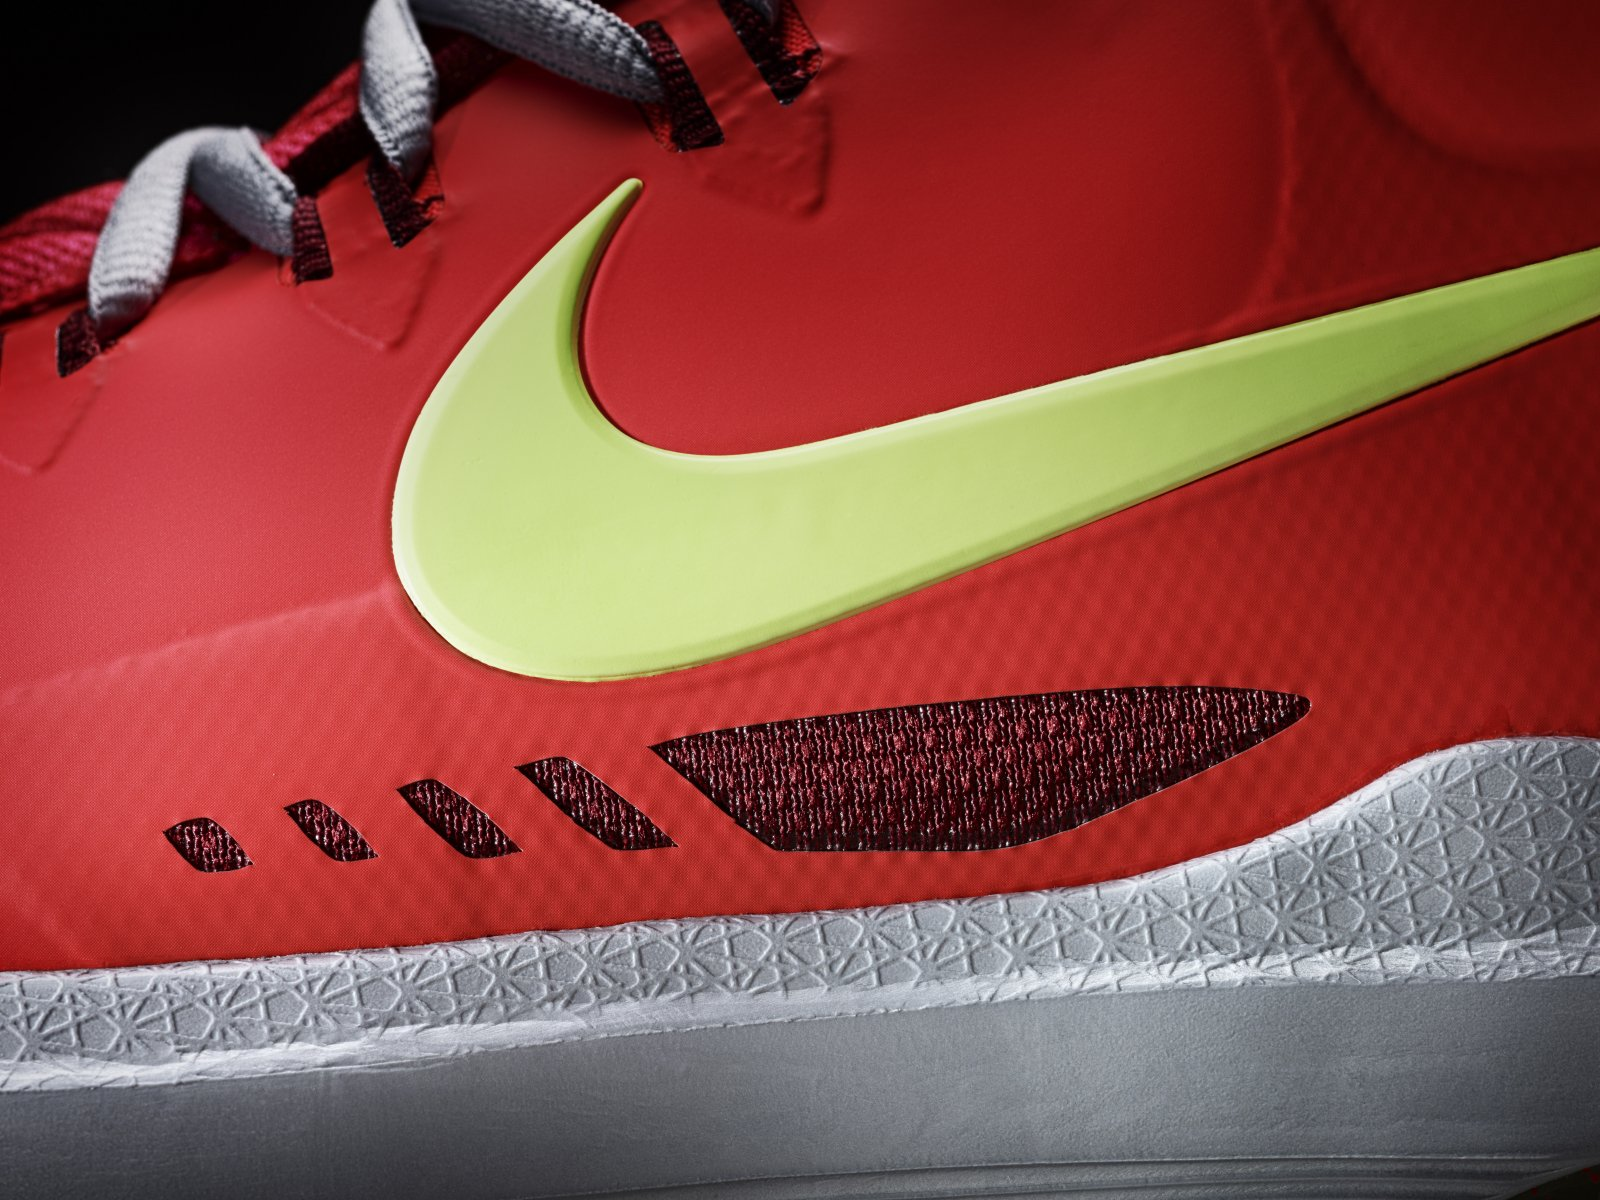 db09acd77c1 Nike KD Trey 5 V Mens 897638-003 Black Rage Green Basketball Shoes Size 12